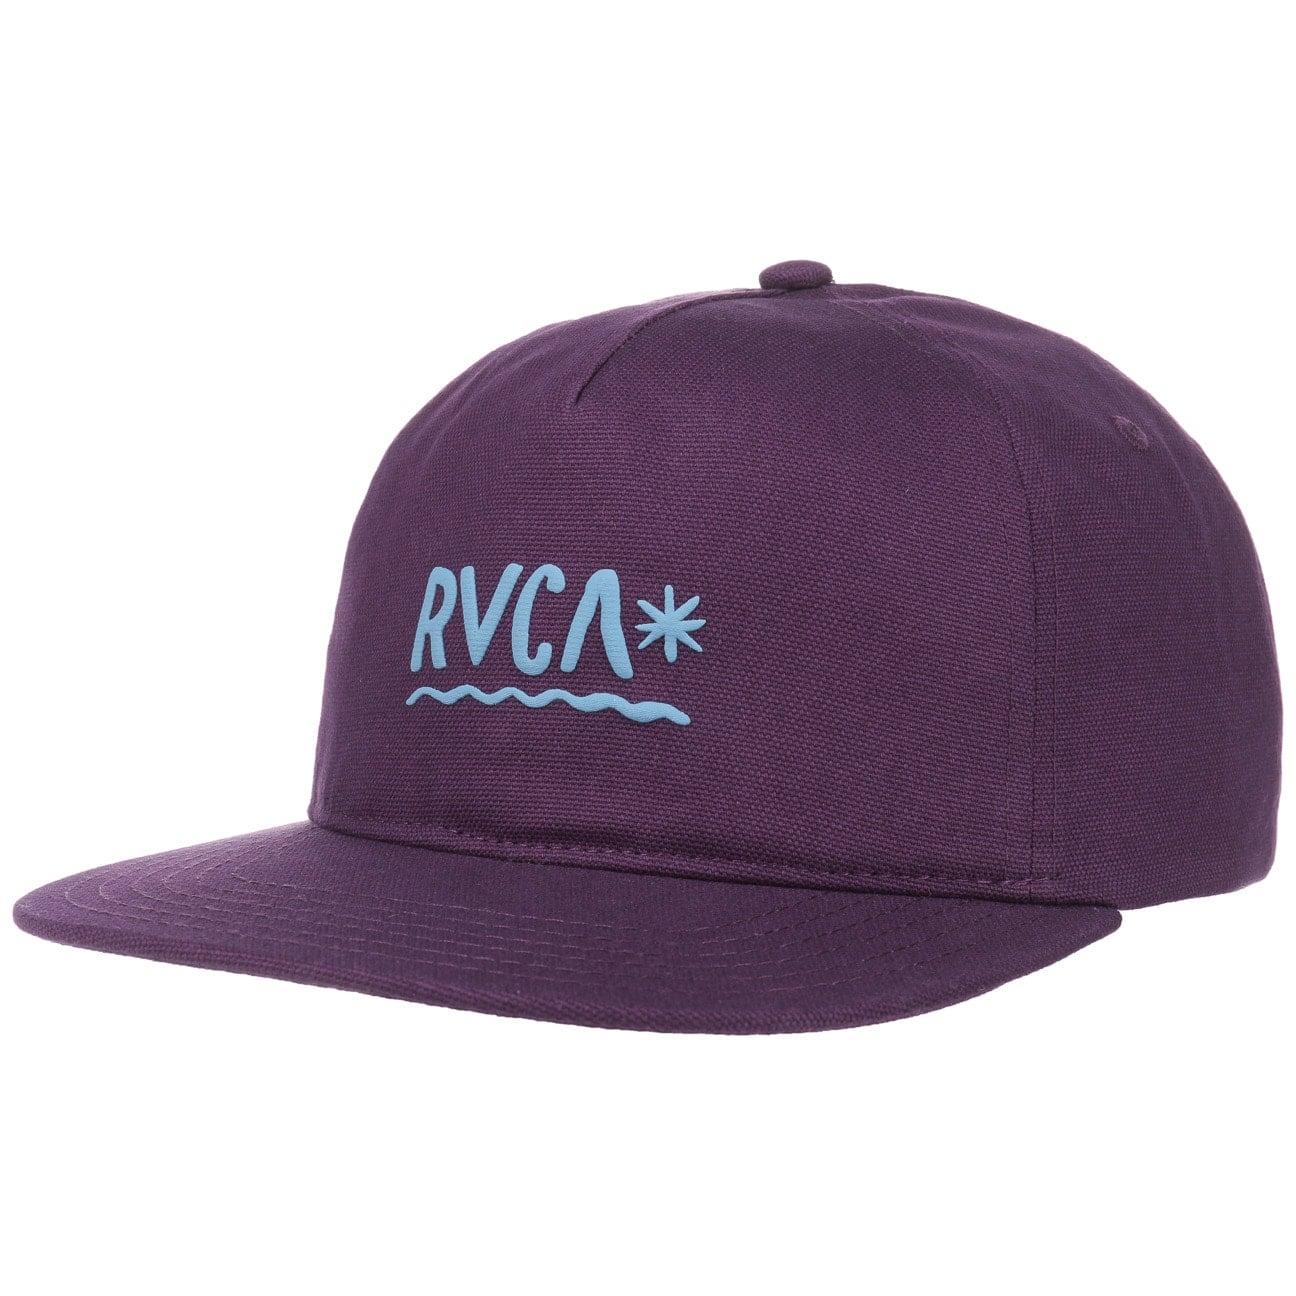 Gorra Squig Snapback by RVCA